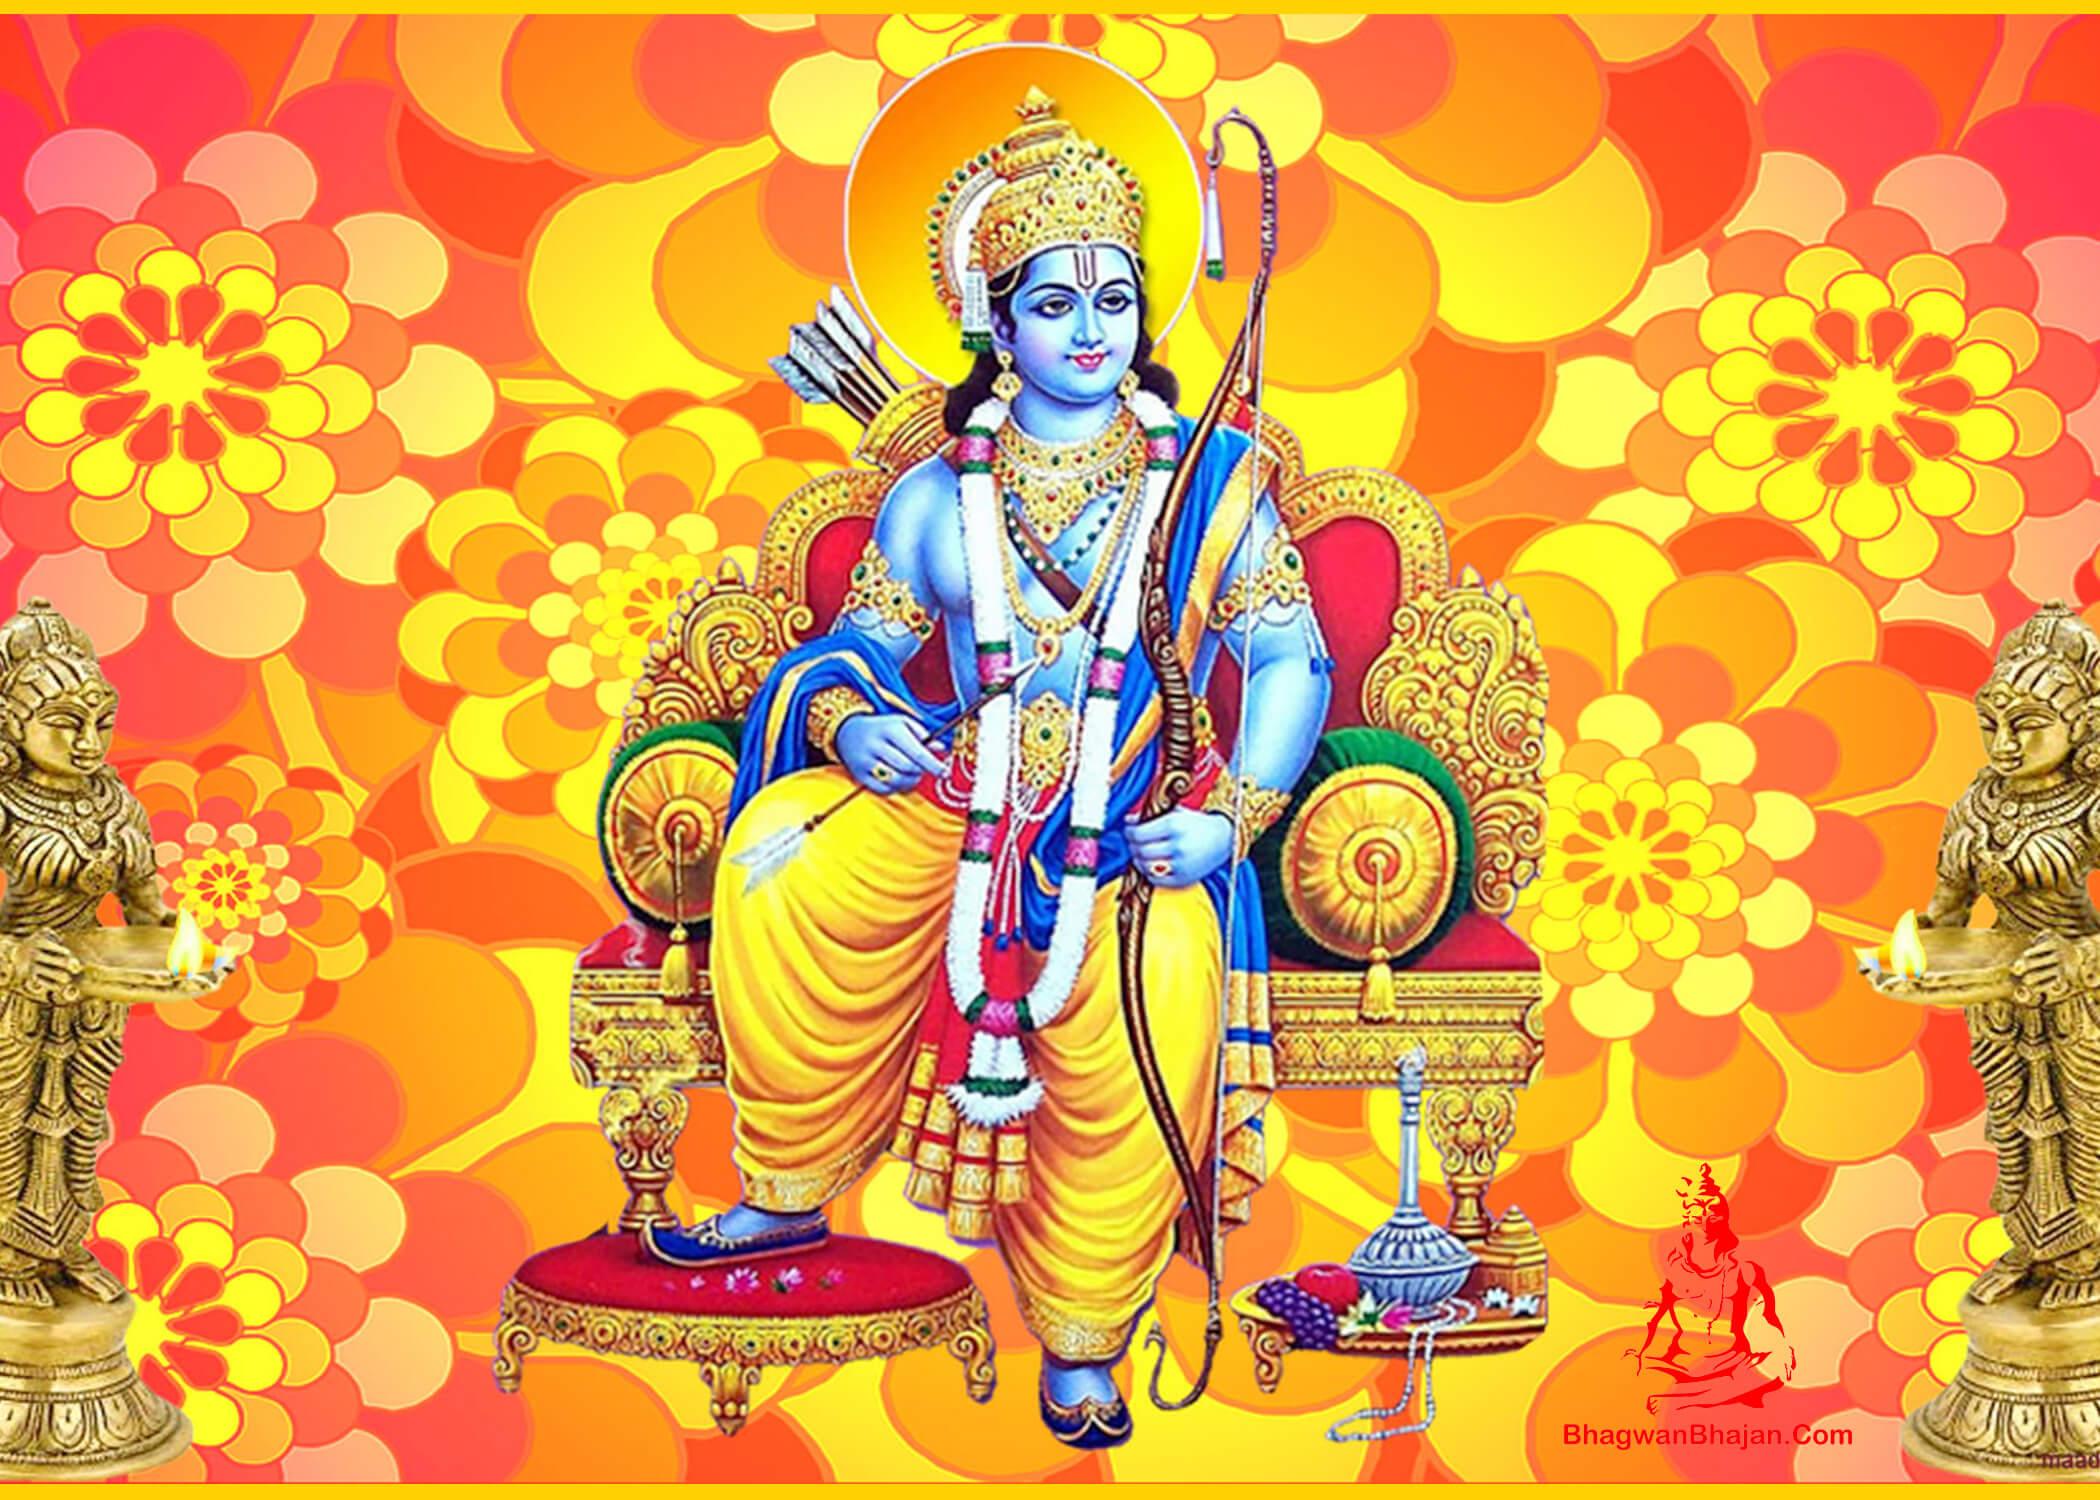 ayodhyapati prabhu shri ram